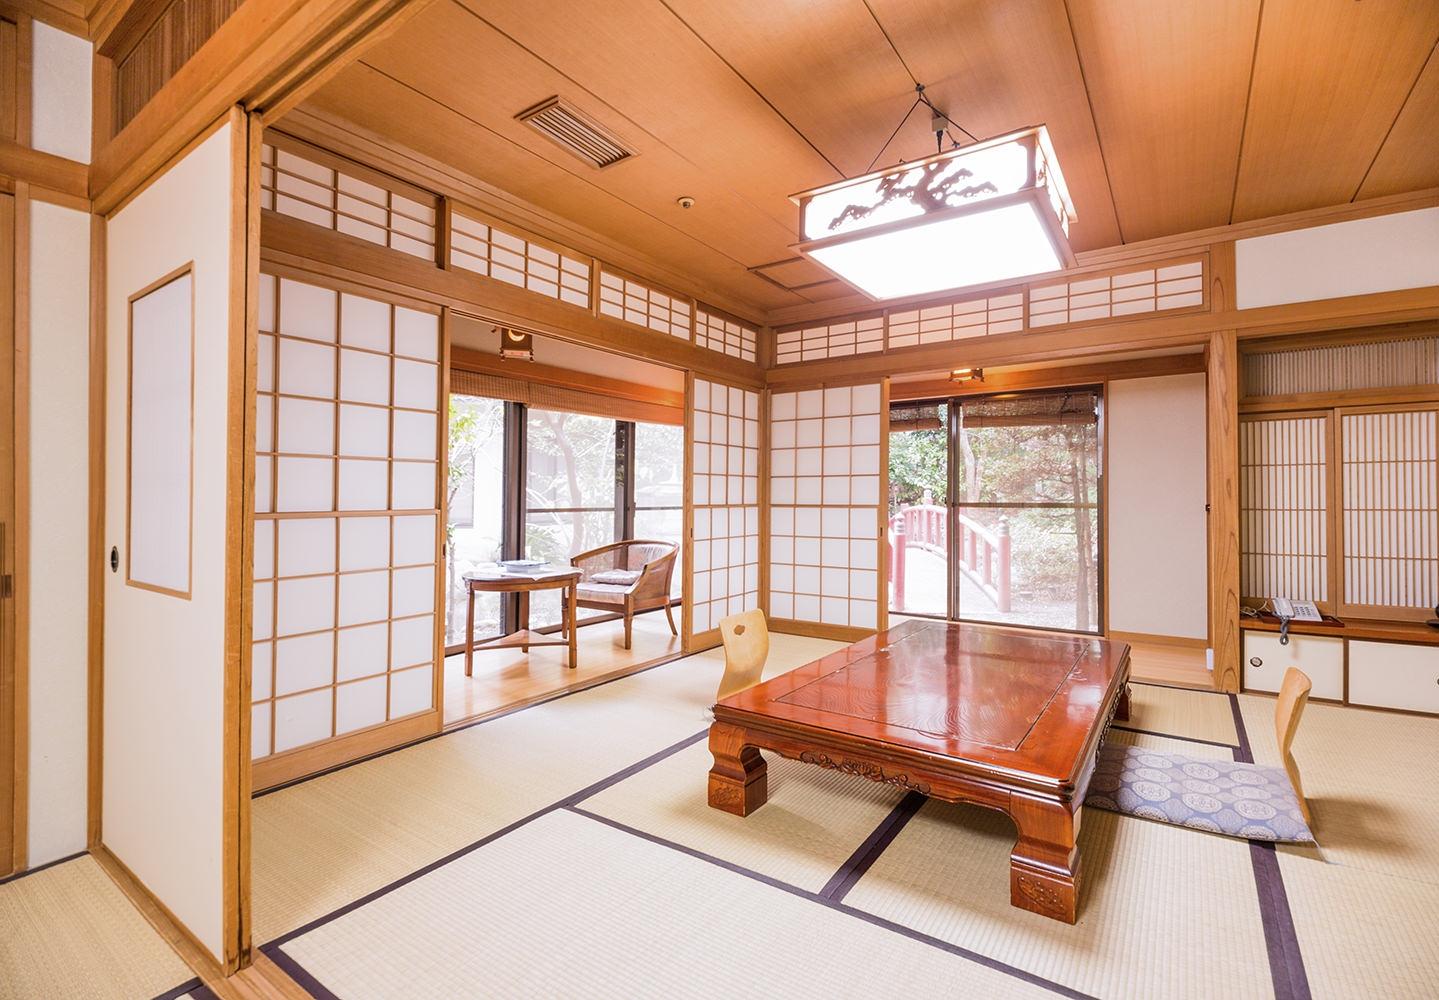 HOTEL86_kuturogeruwashitu20150124151633500